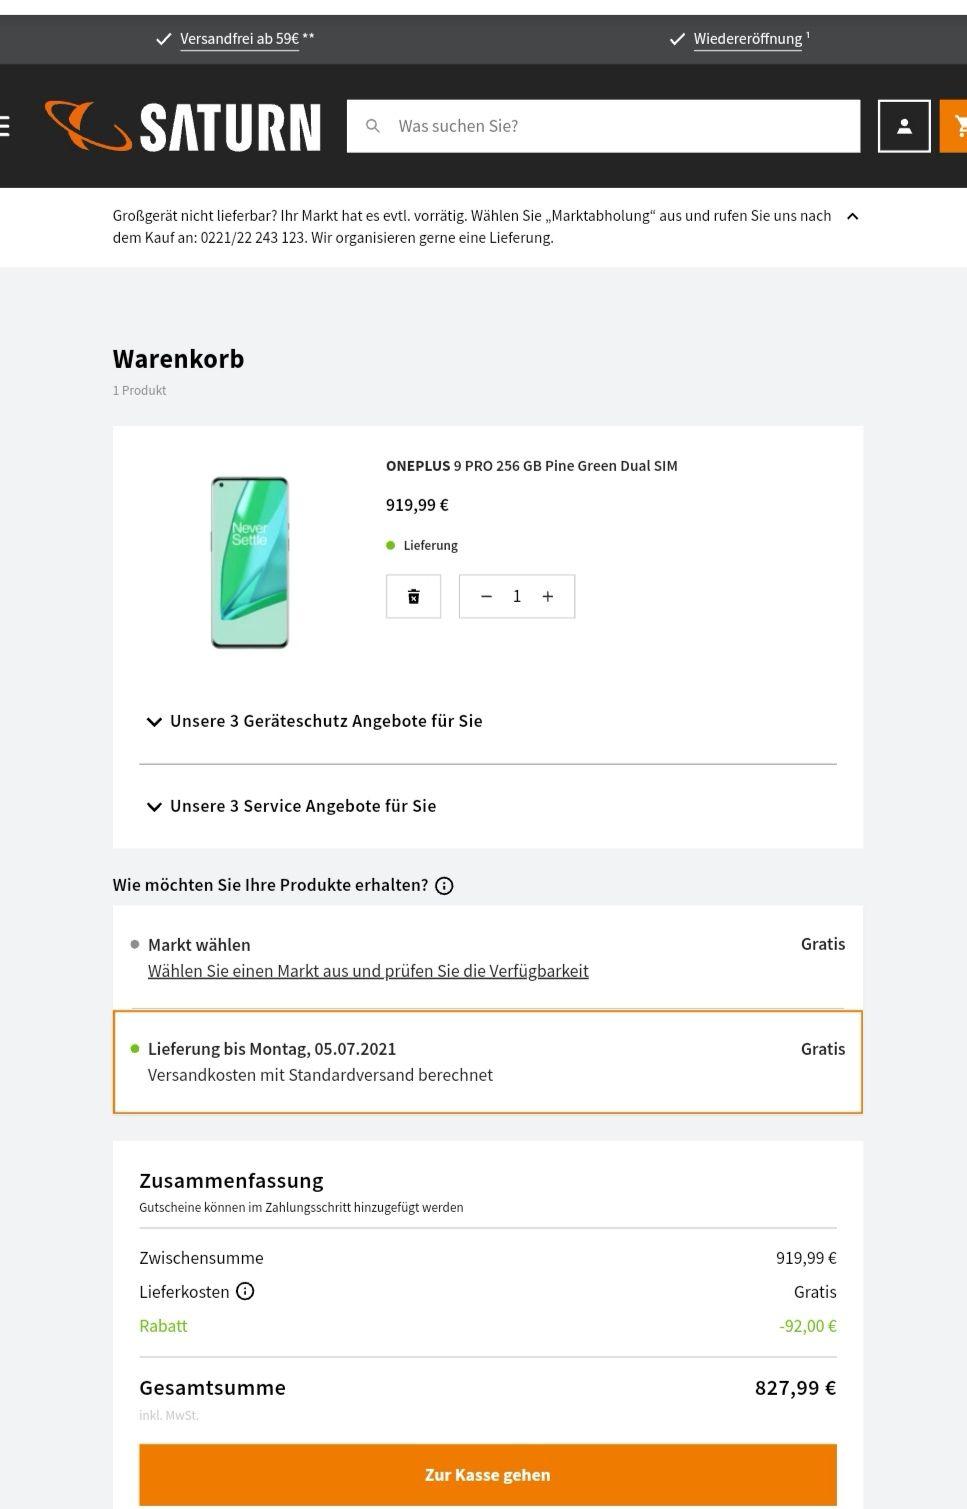 Oneplus 9 pro 12/256GB pine green dual SIM [Saturn Aktion]